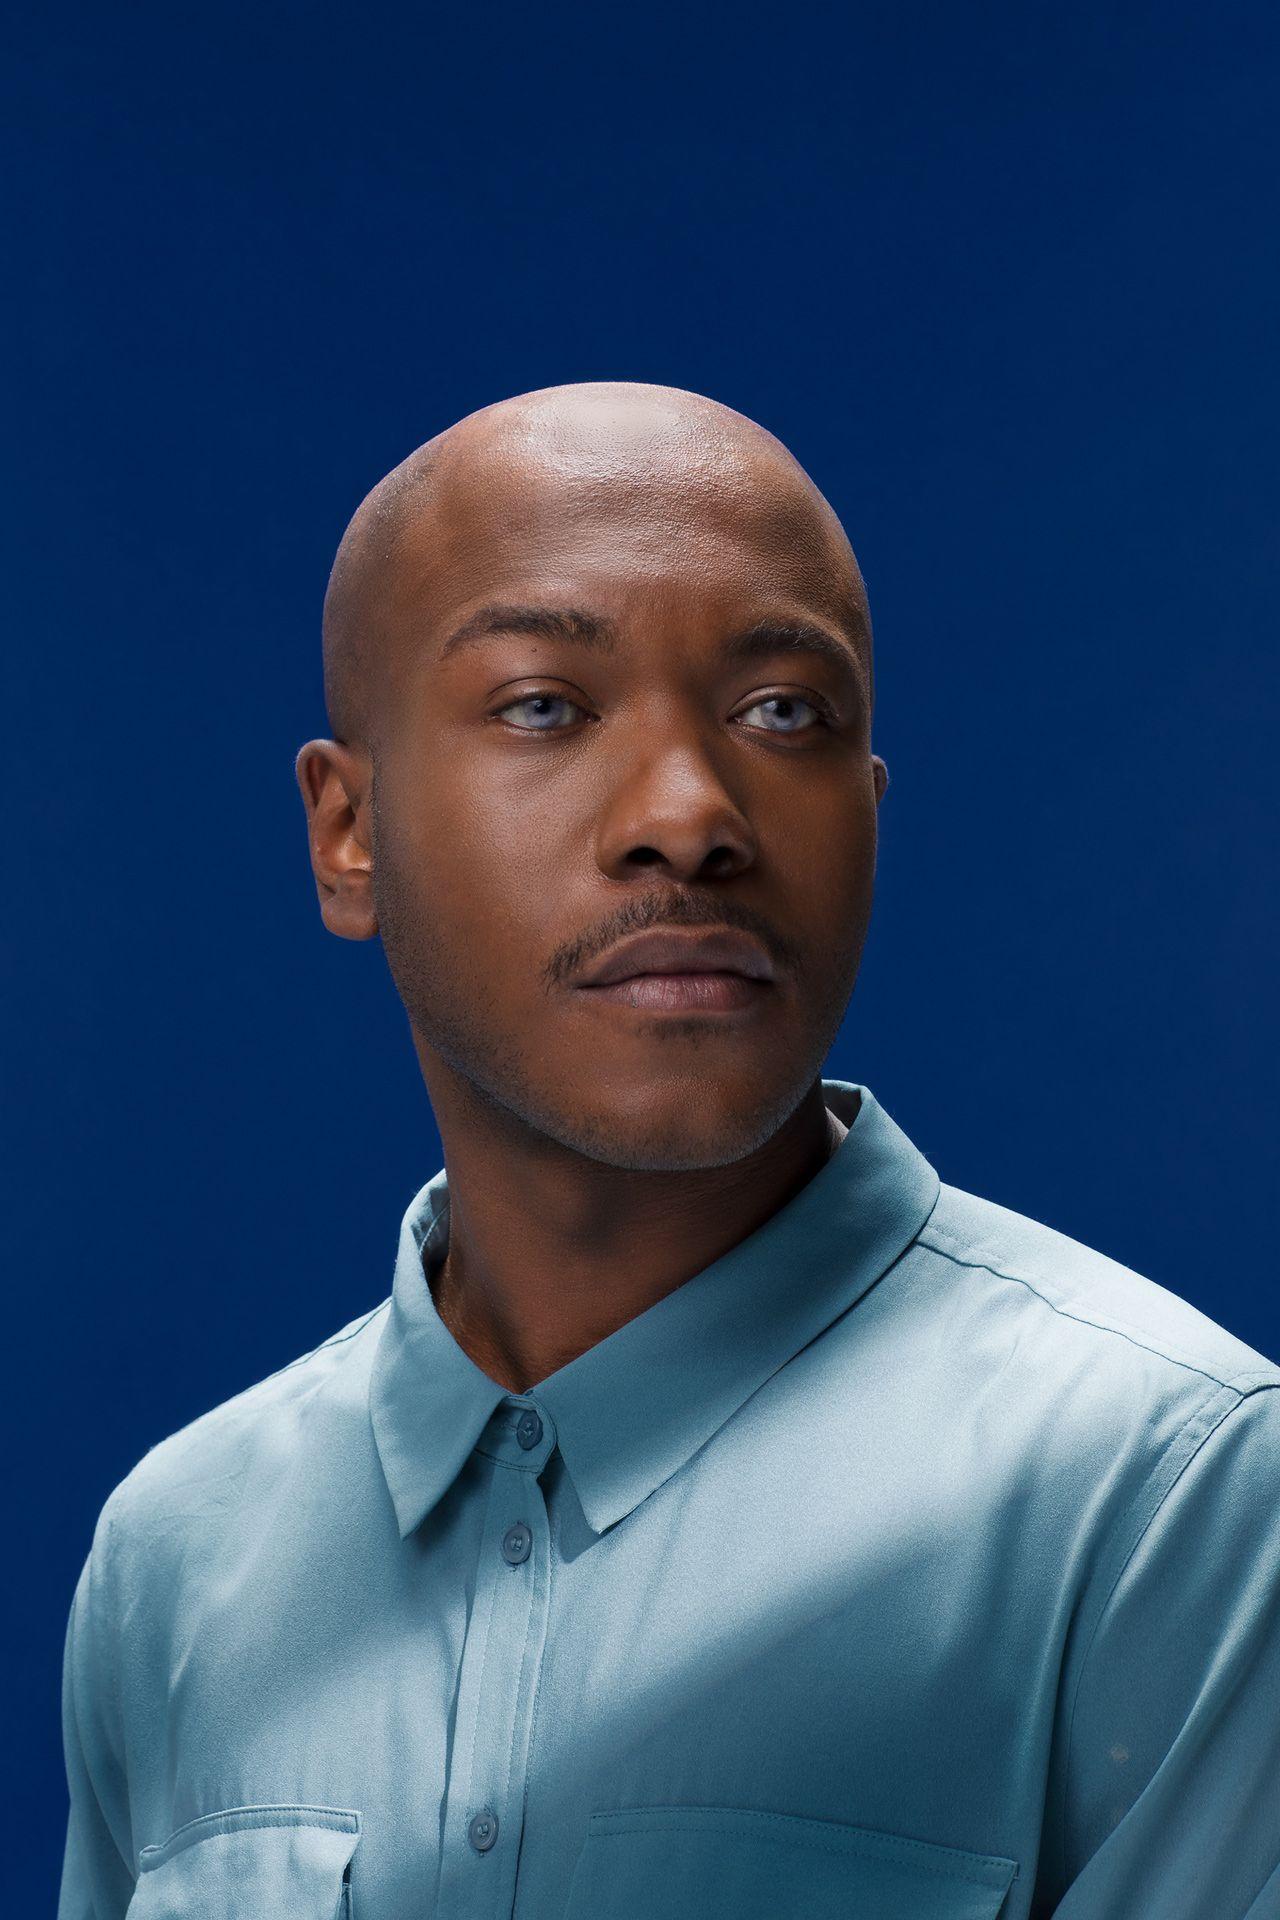 portrait of black man bald light blue eyes wearing light blue buttoned up shirt on dark blue background by Simon Duhamel for creative project Light & Colours